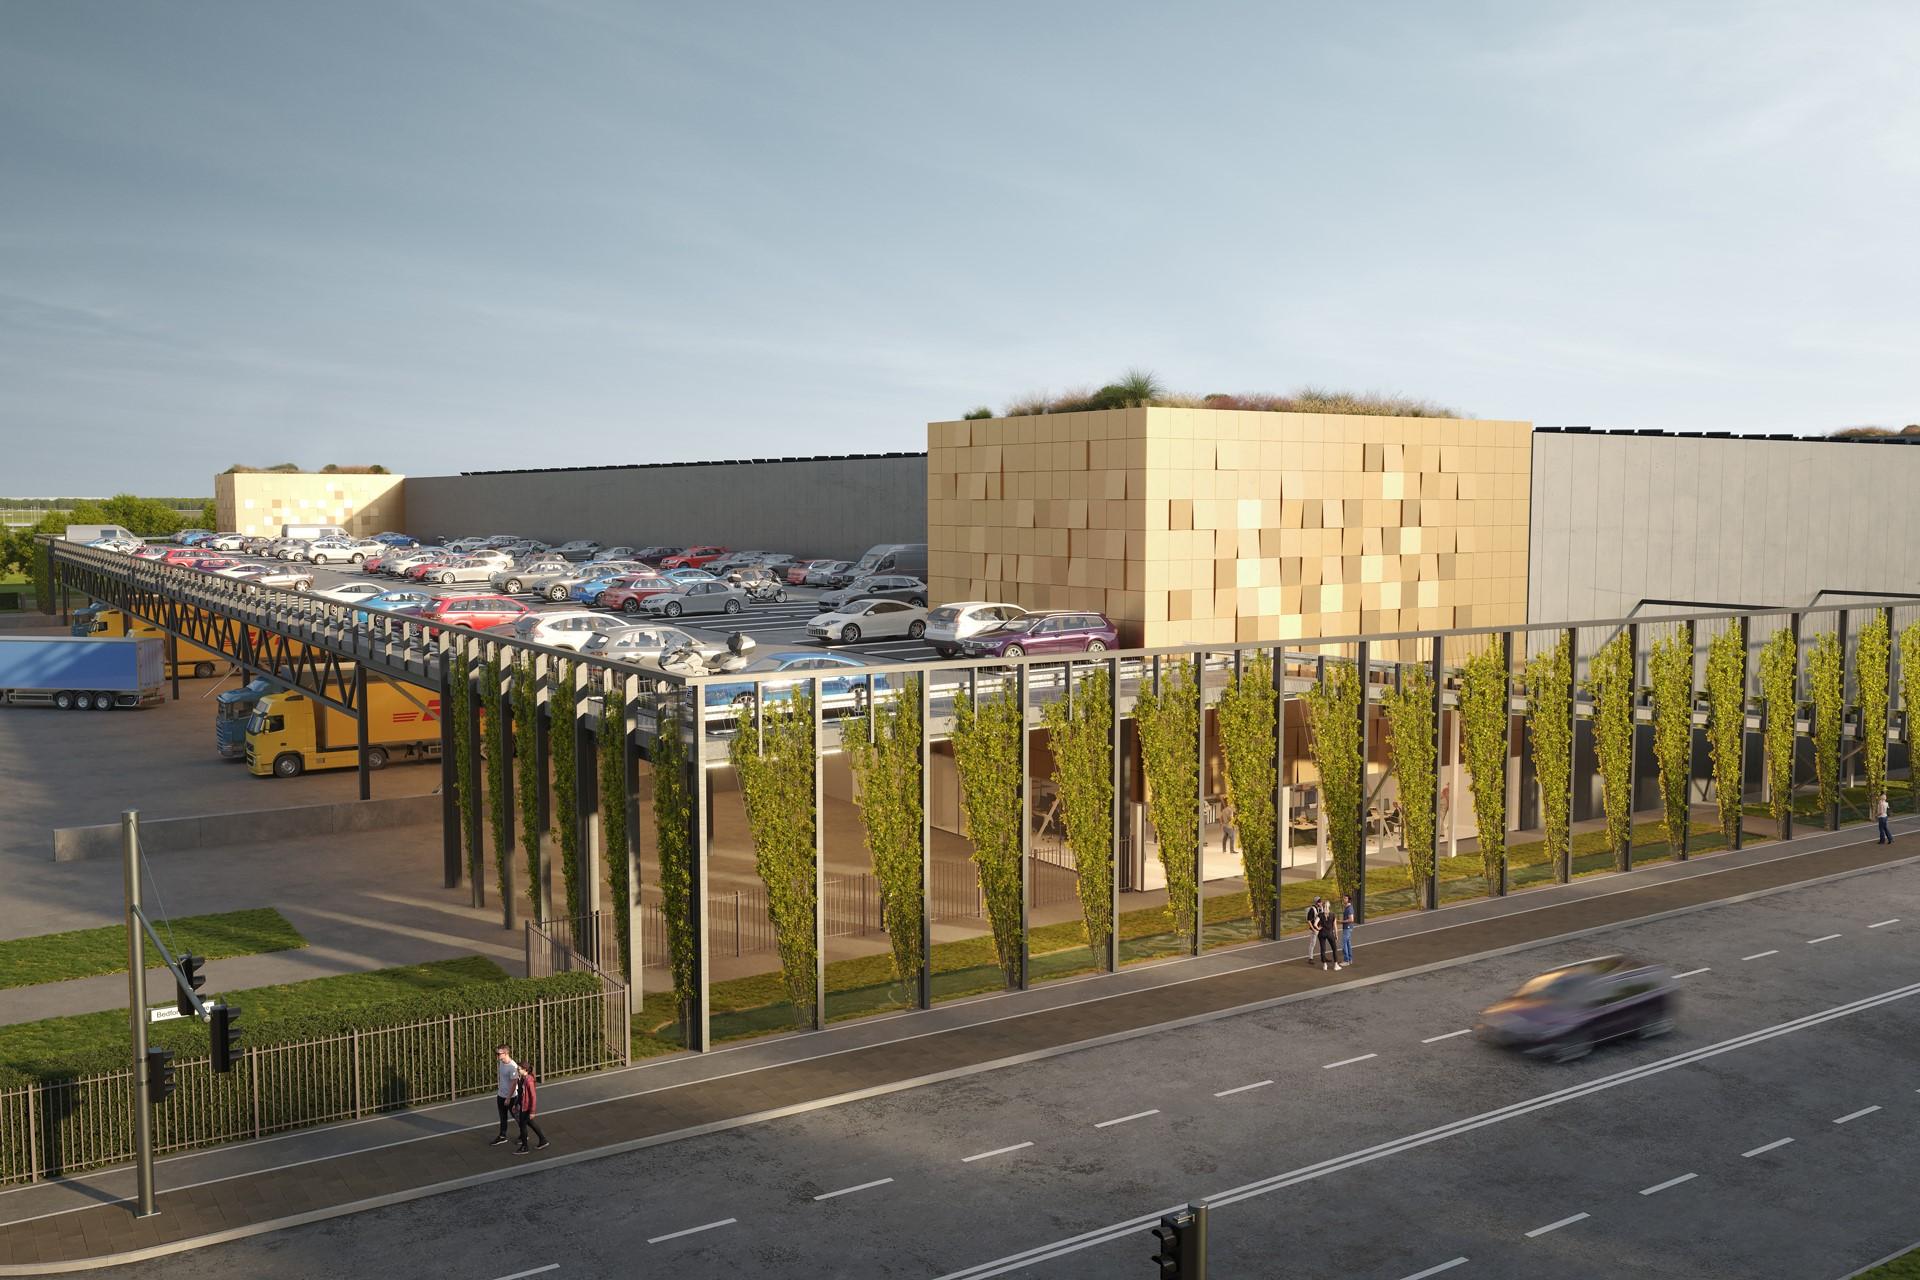 VDG Real Estate Sells VDG Warehouse Schiphol I for 47 million to Savills Investment Management